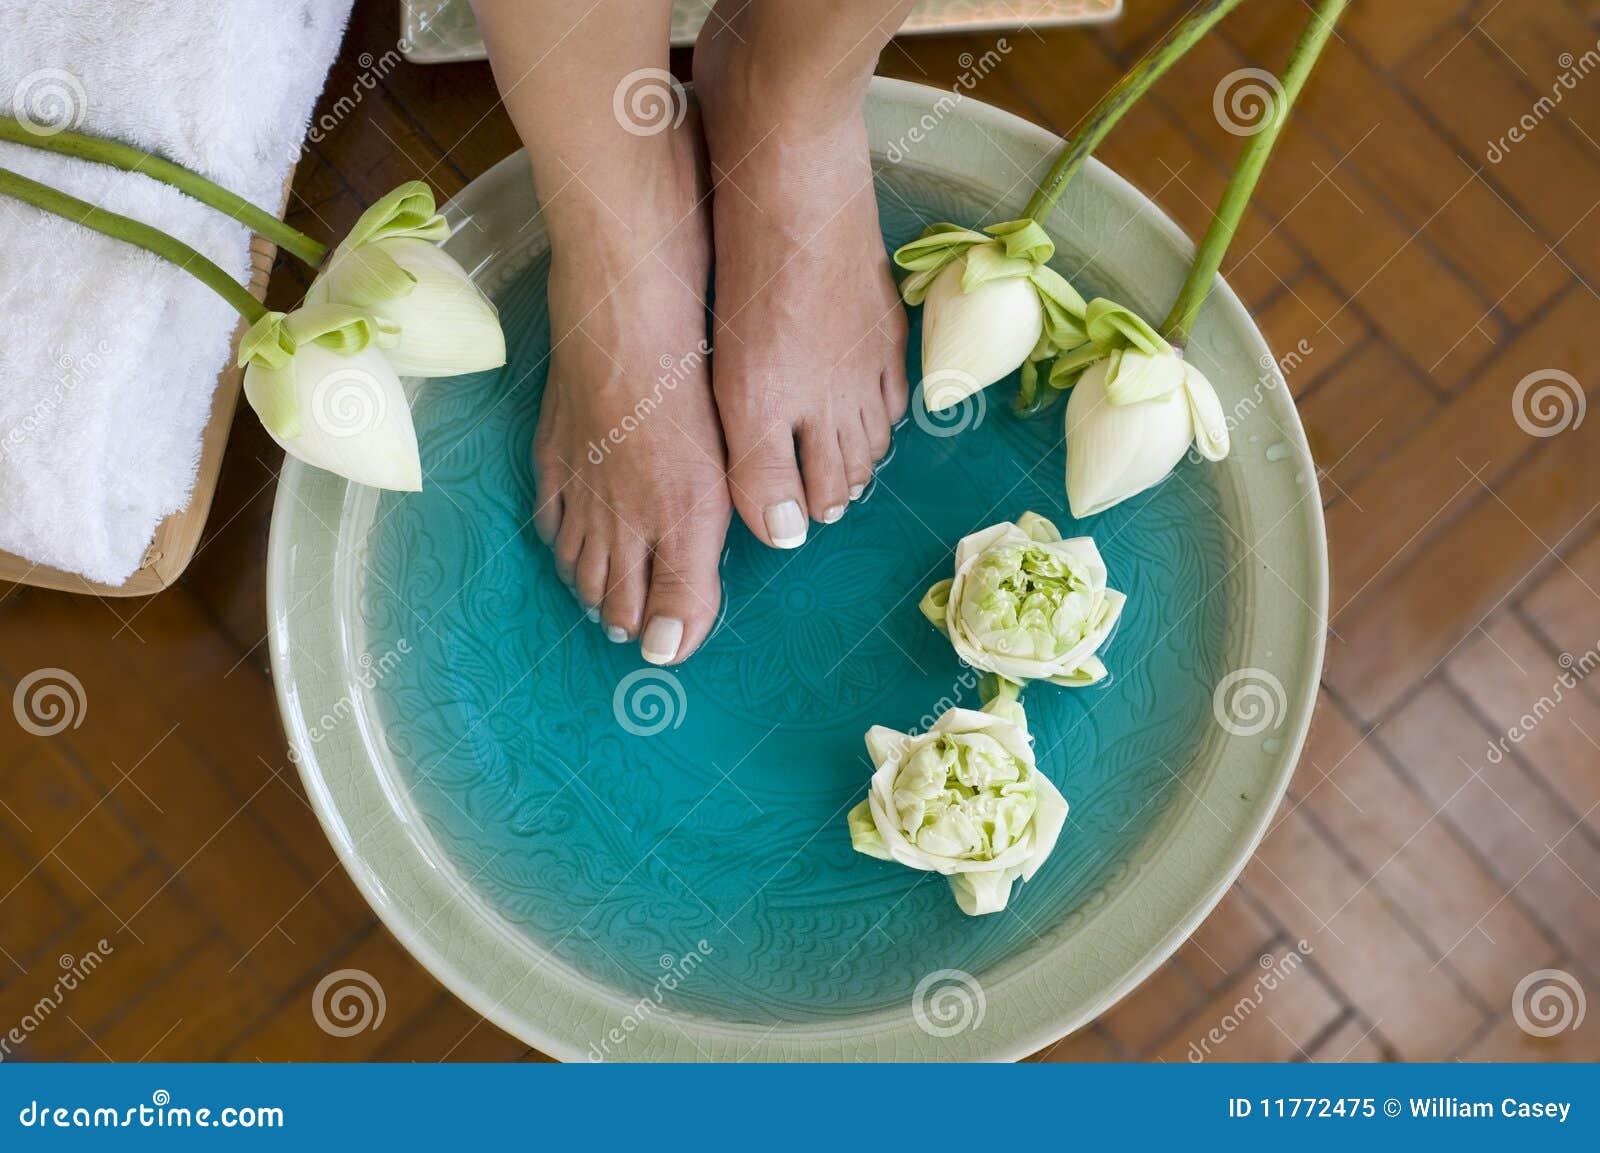 Lotus flower aromatherapy spa for feet 2 stock image image of lotus flower aromatherapy spa for feet 2 mightylinksfo